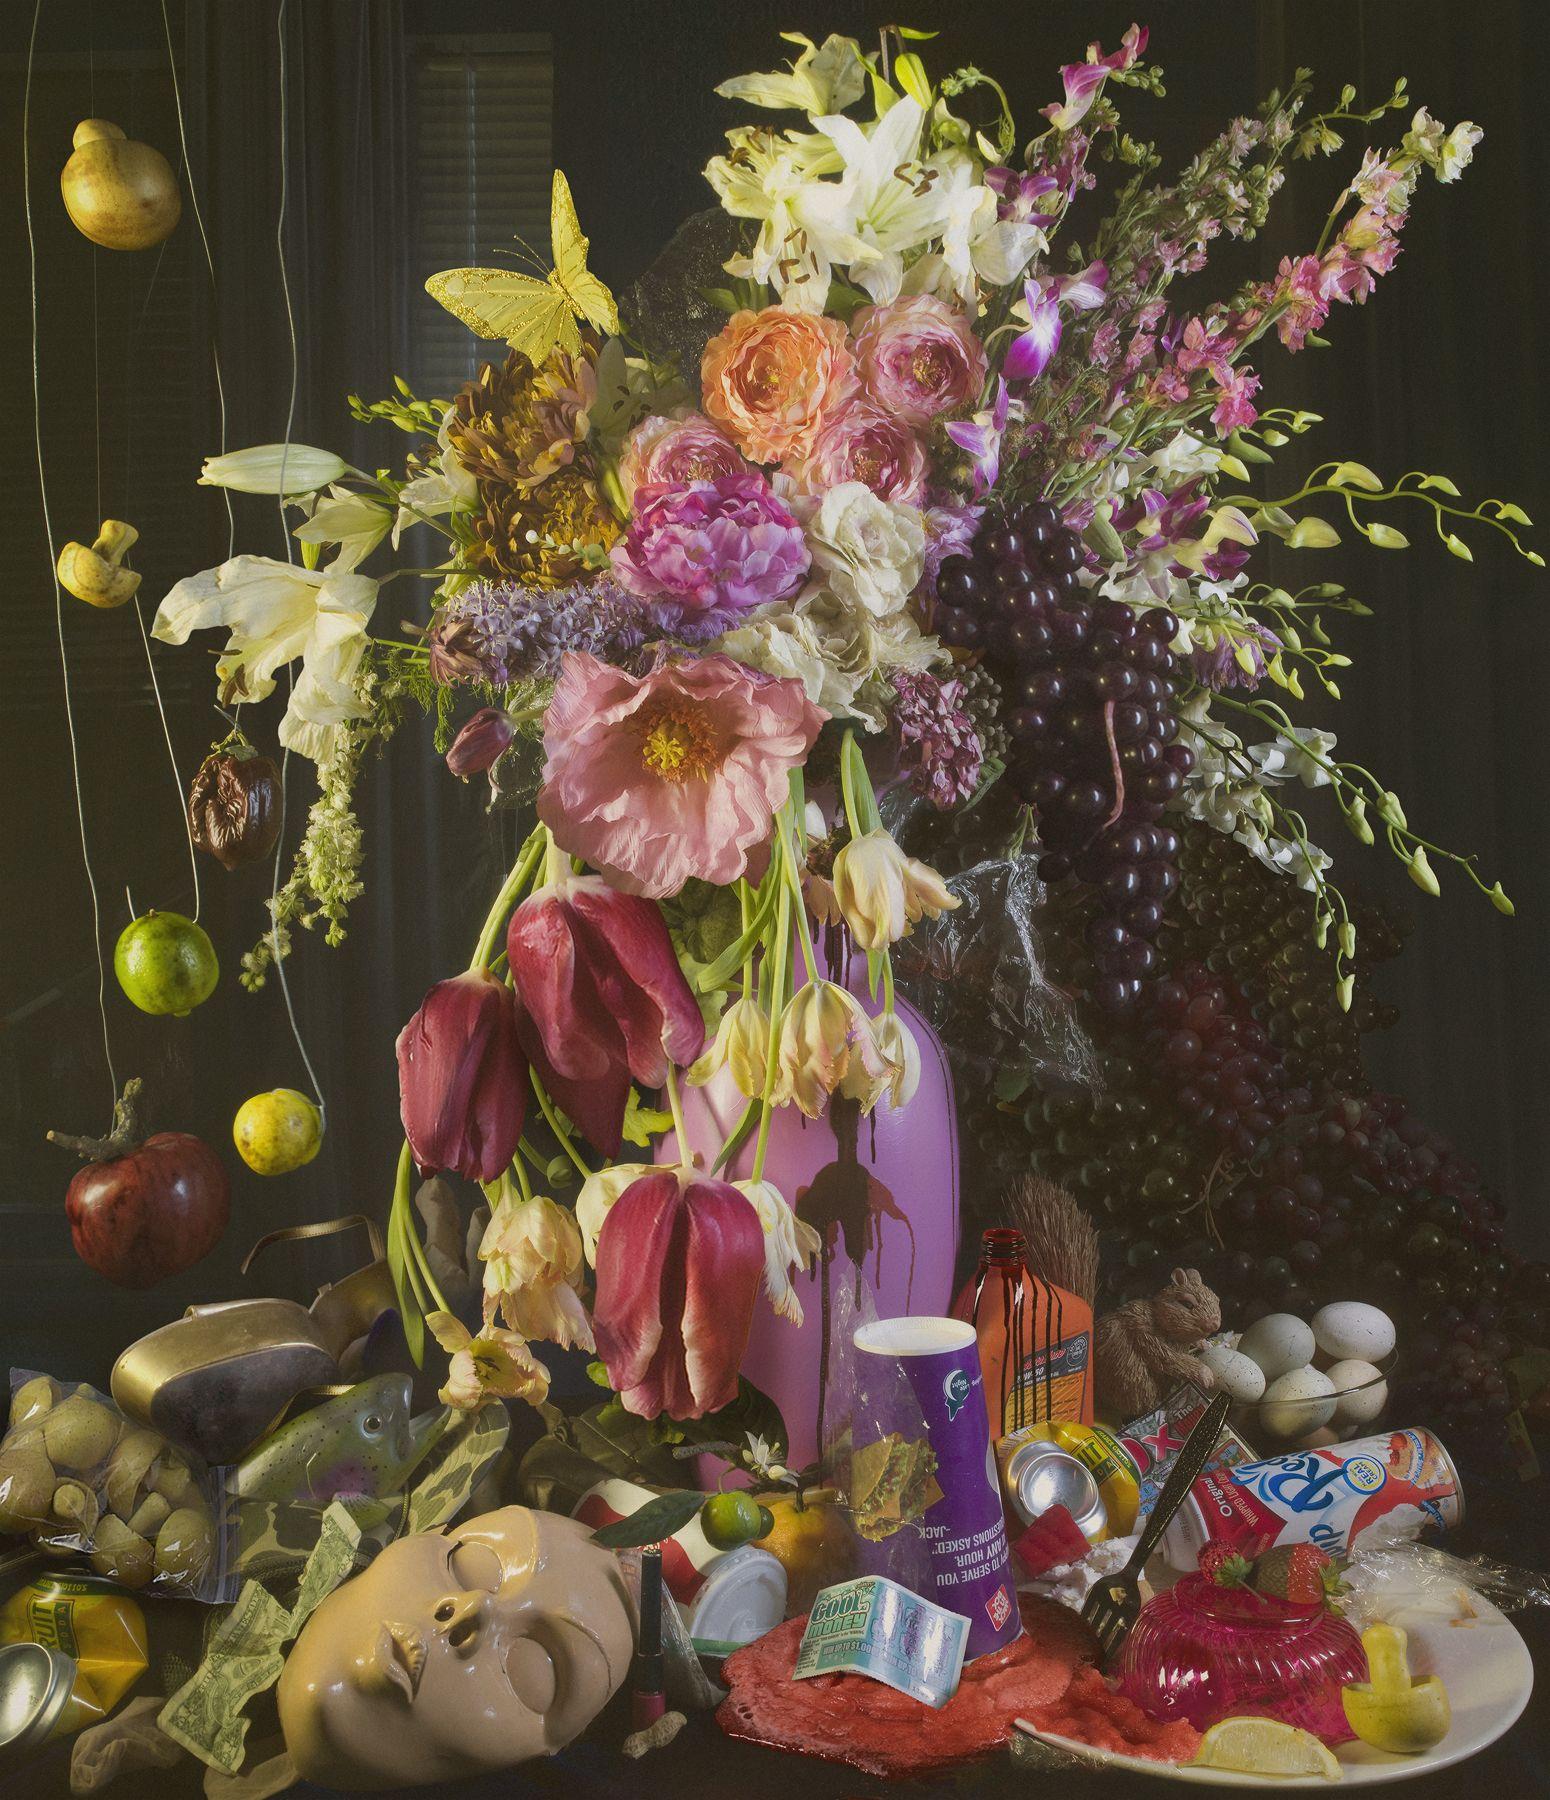 David LaChapelle flowers